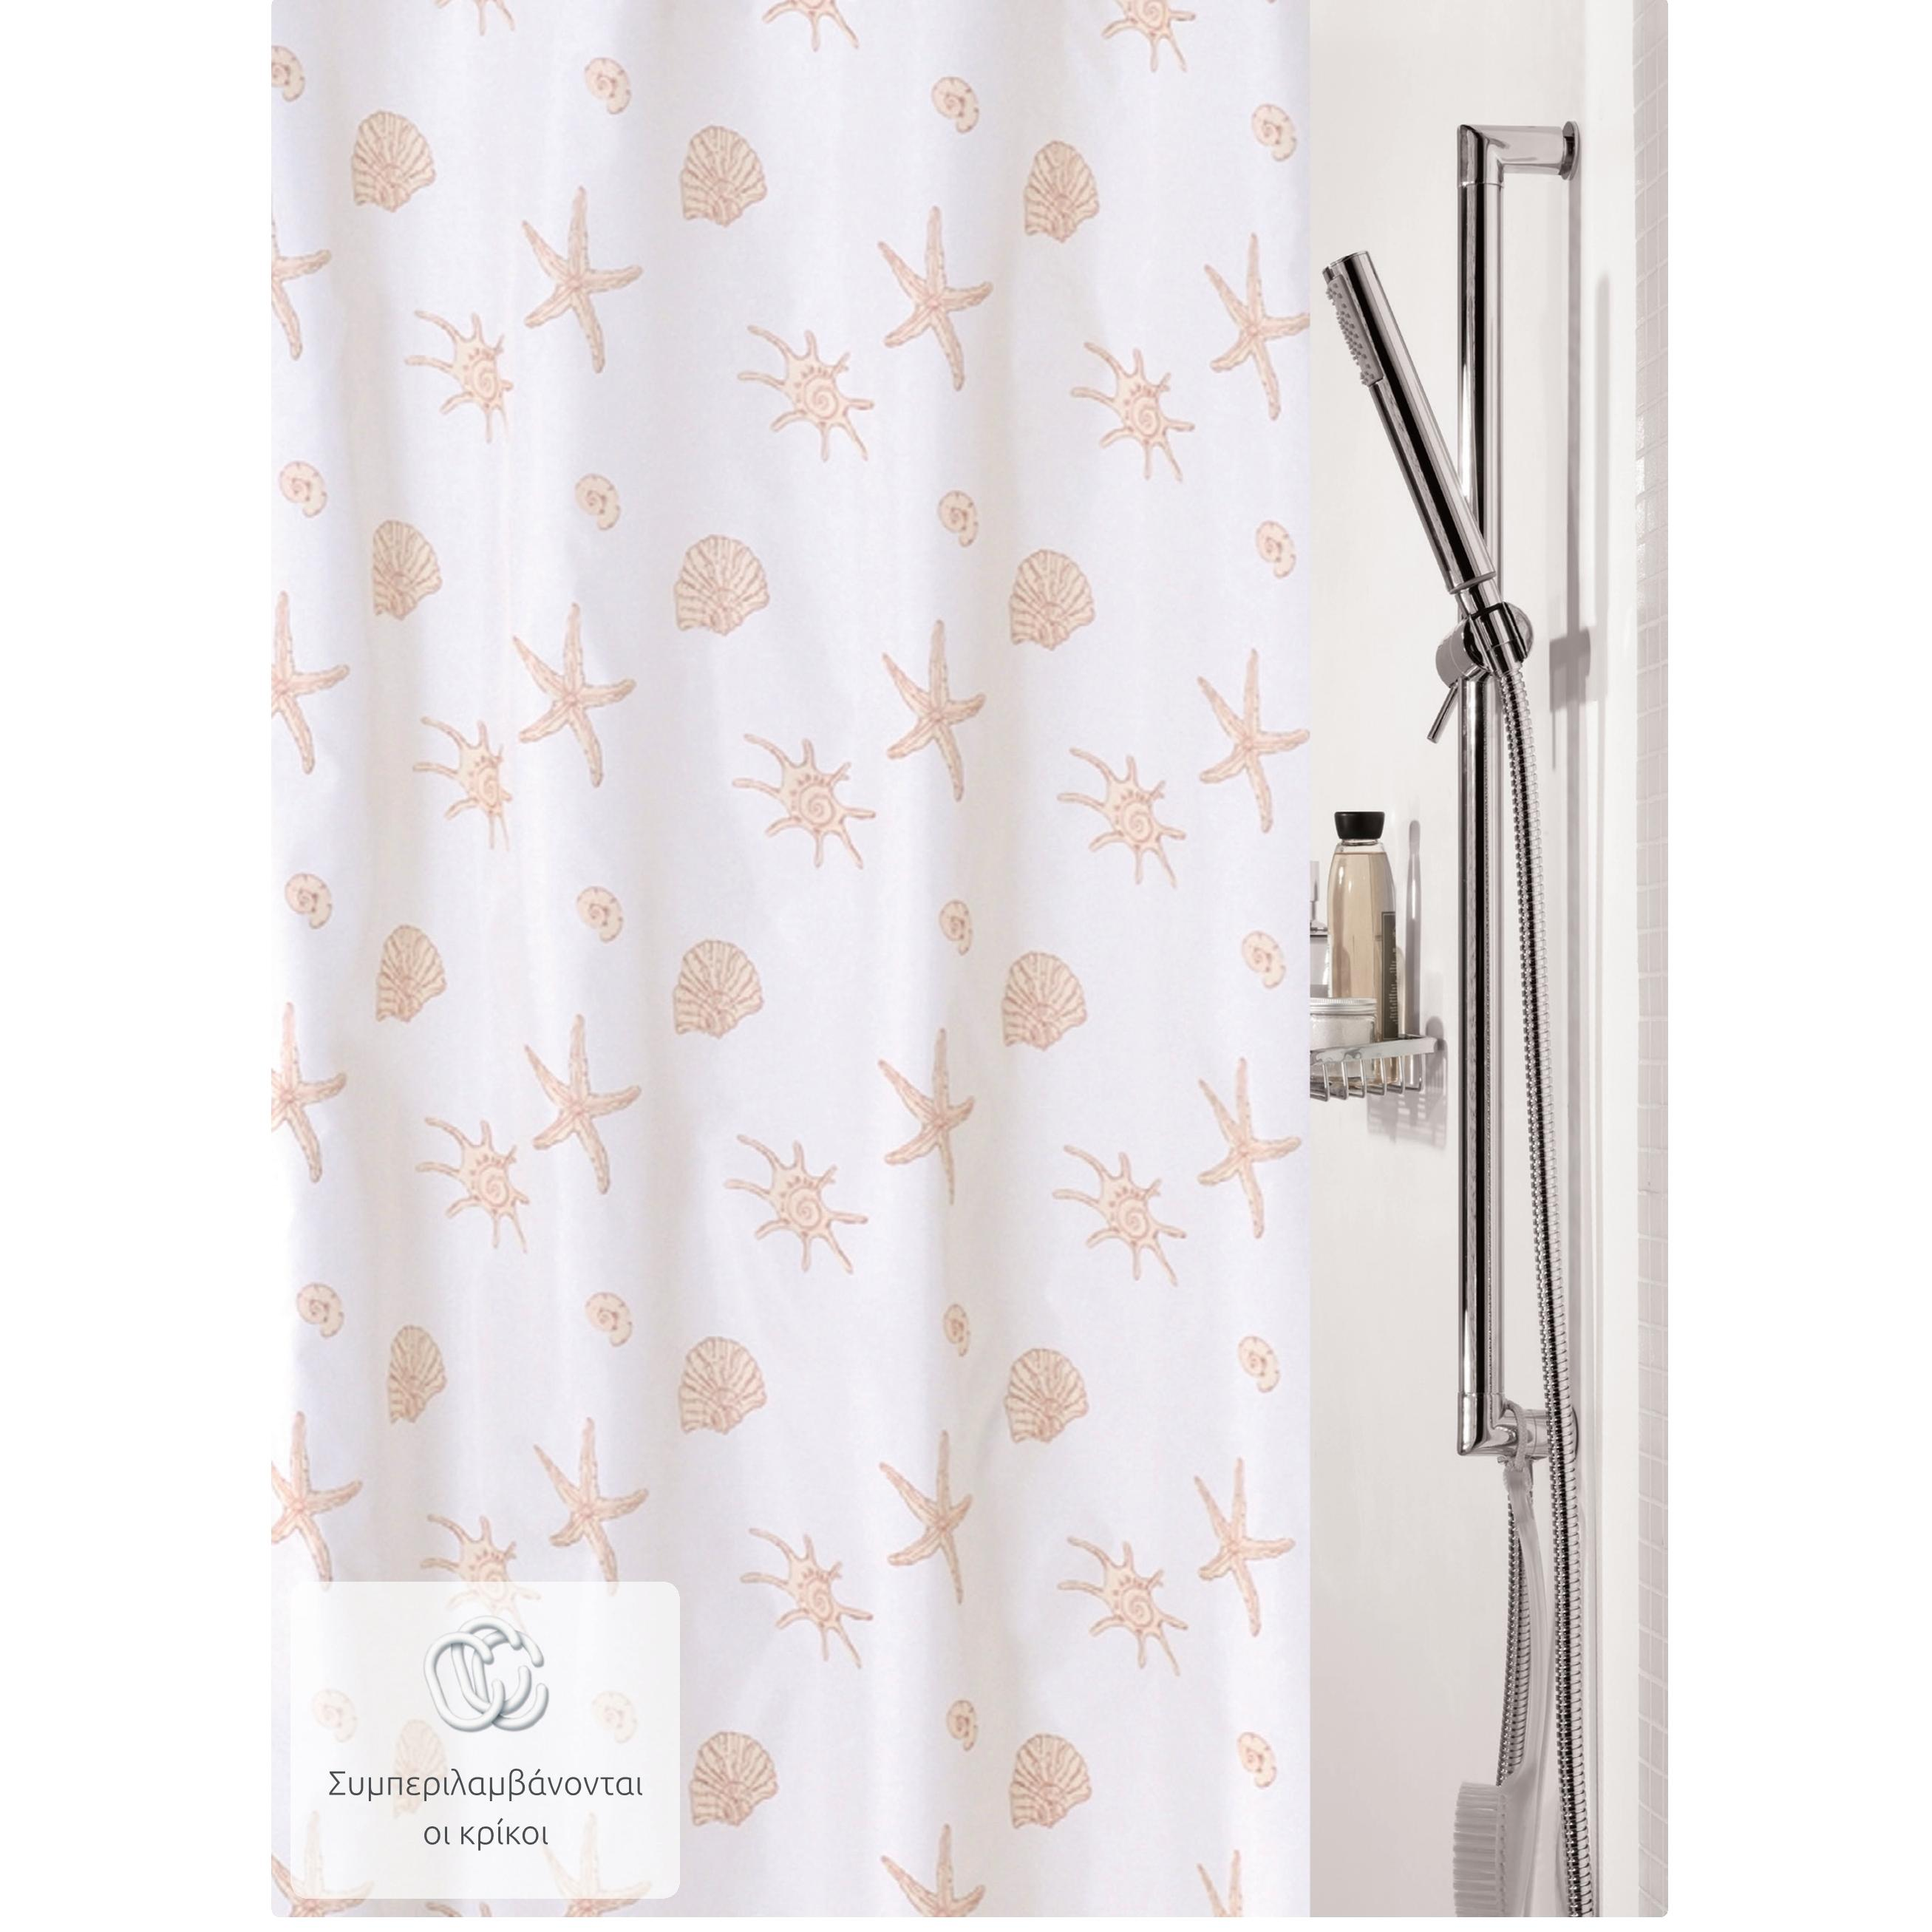 7a56a7a084c Υφασμάτινη κουρτίνα μπάνιου αστερίες 100% polyester 180X200 cm